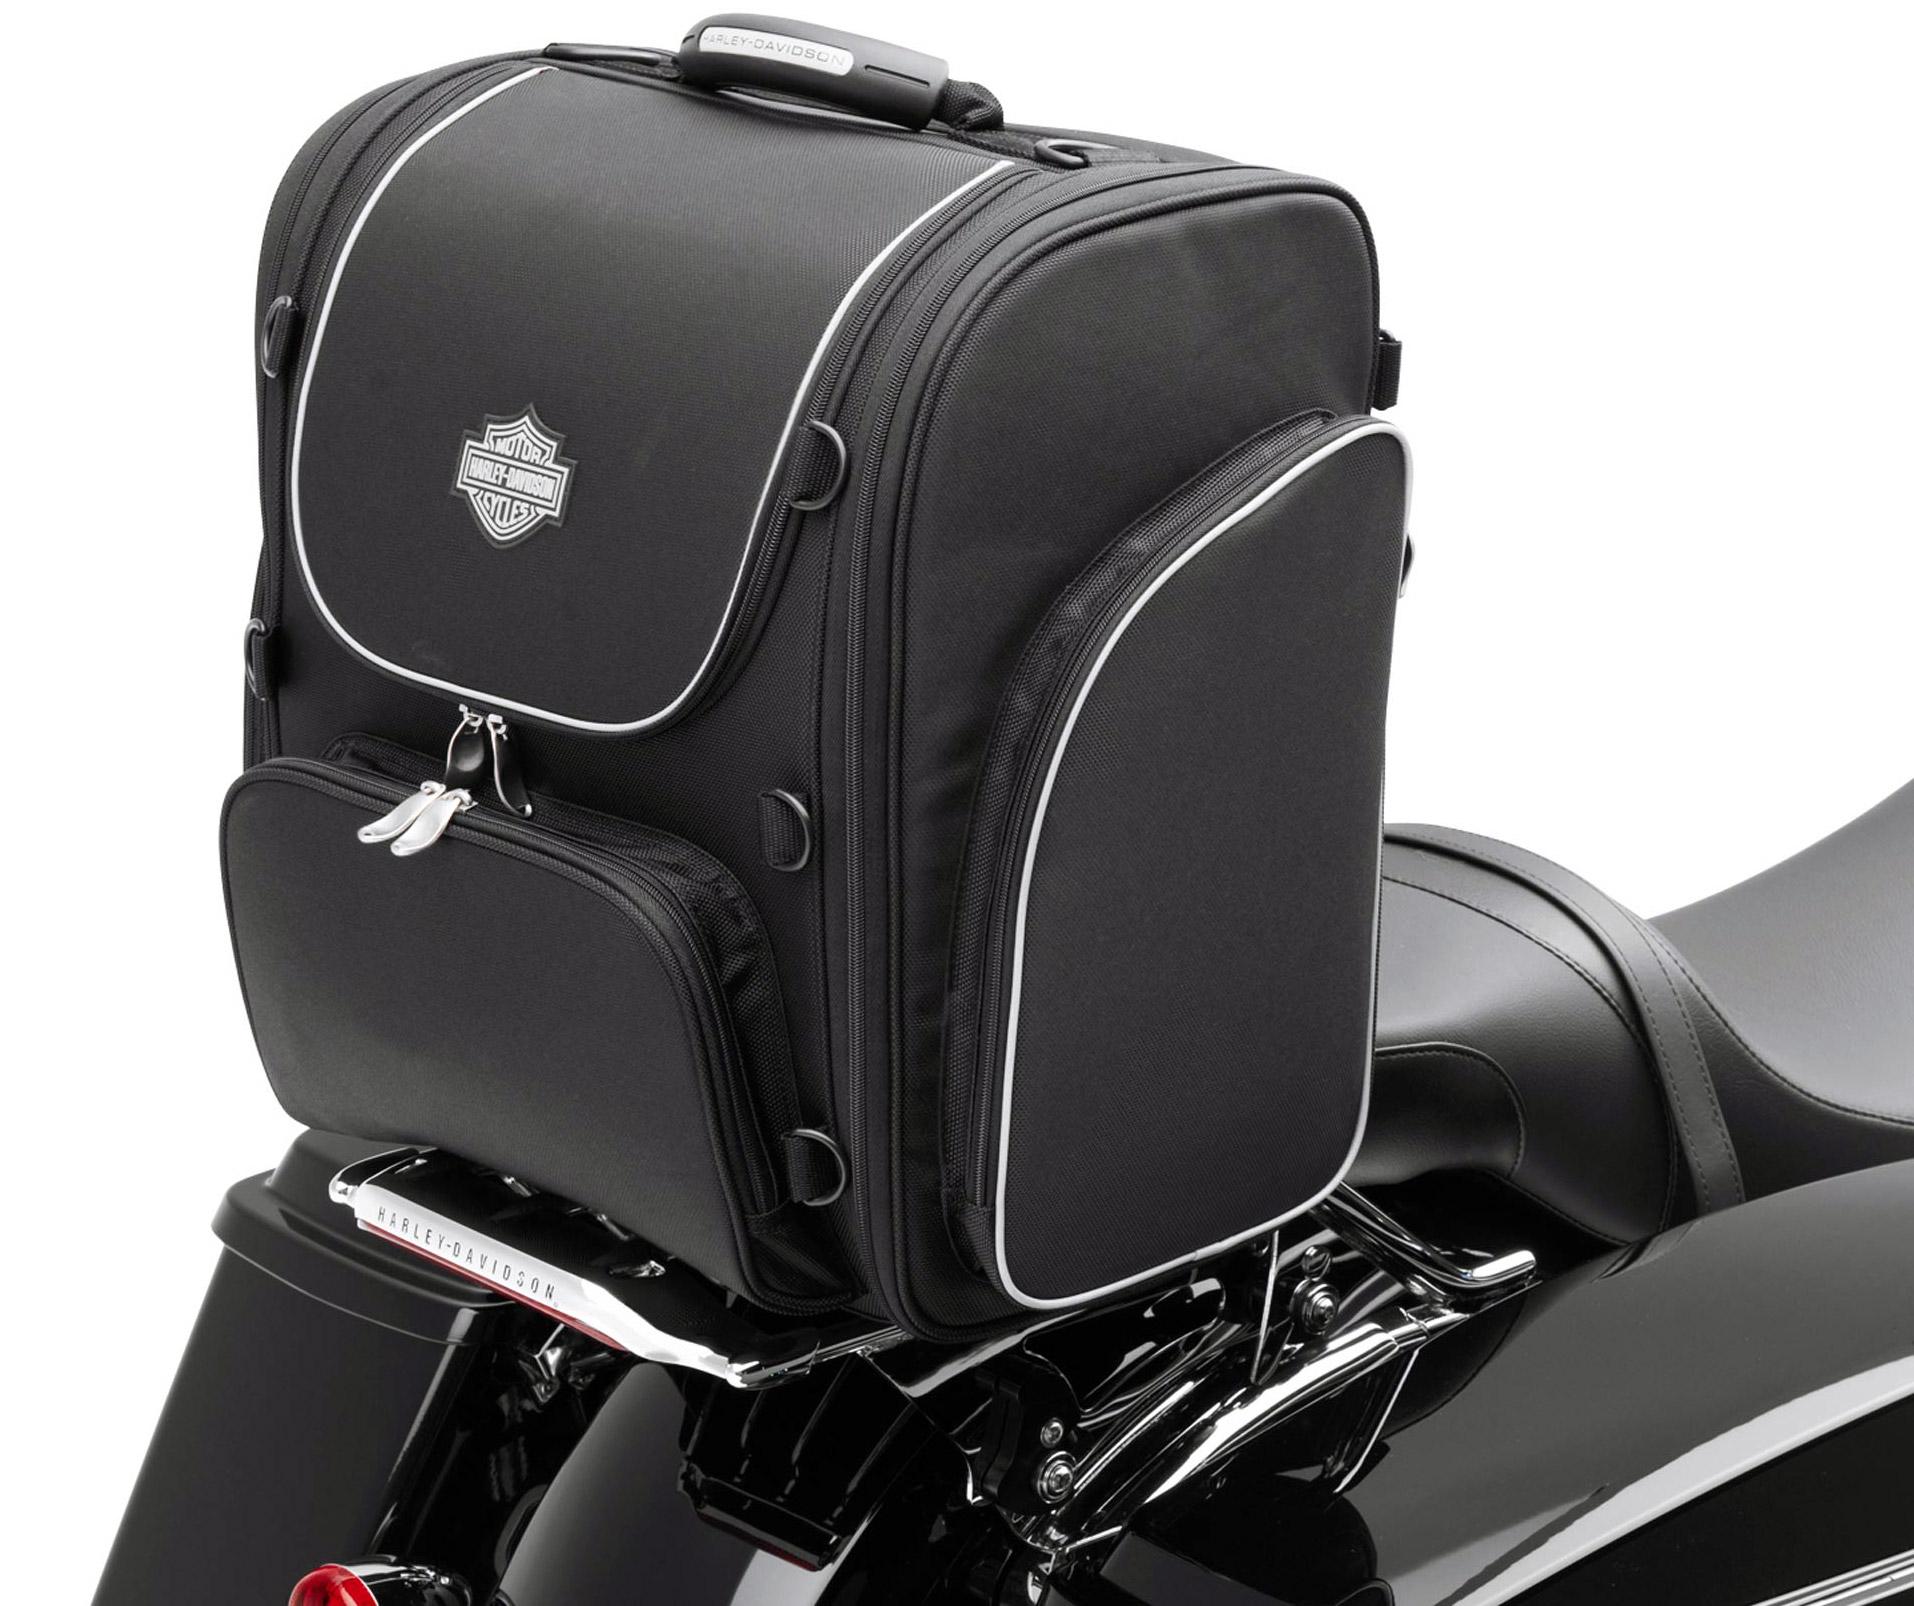 93300004 Harley-Davidson Touring Bag at Thunderbike Shop